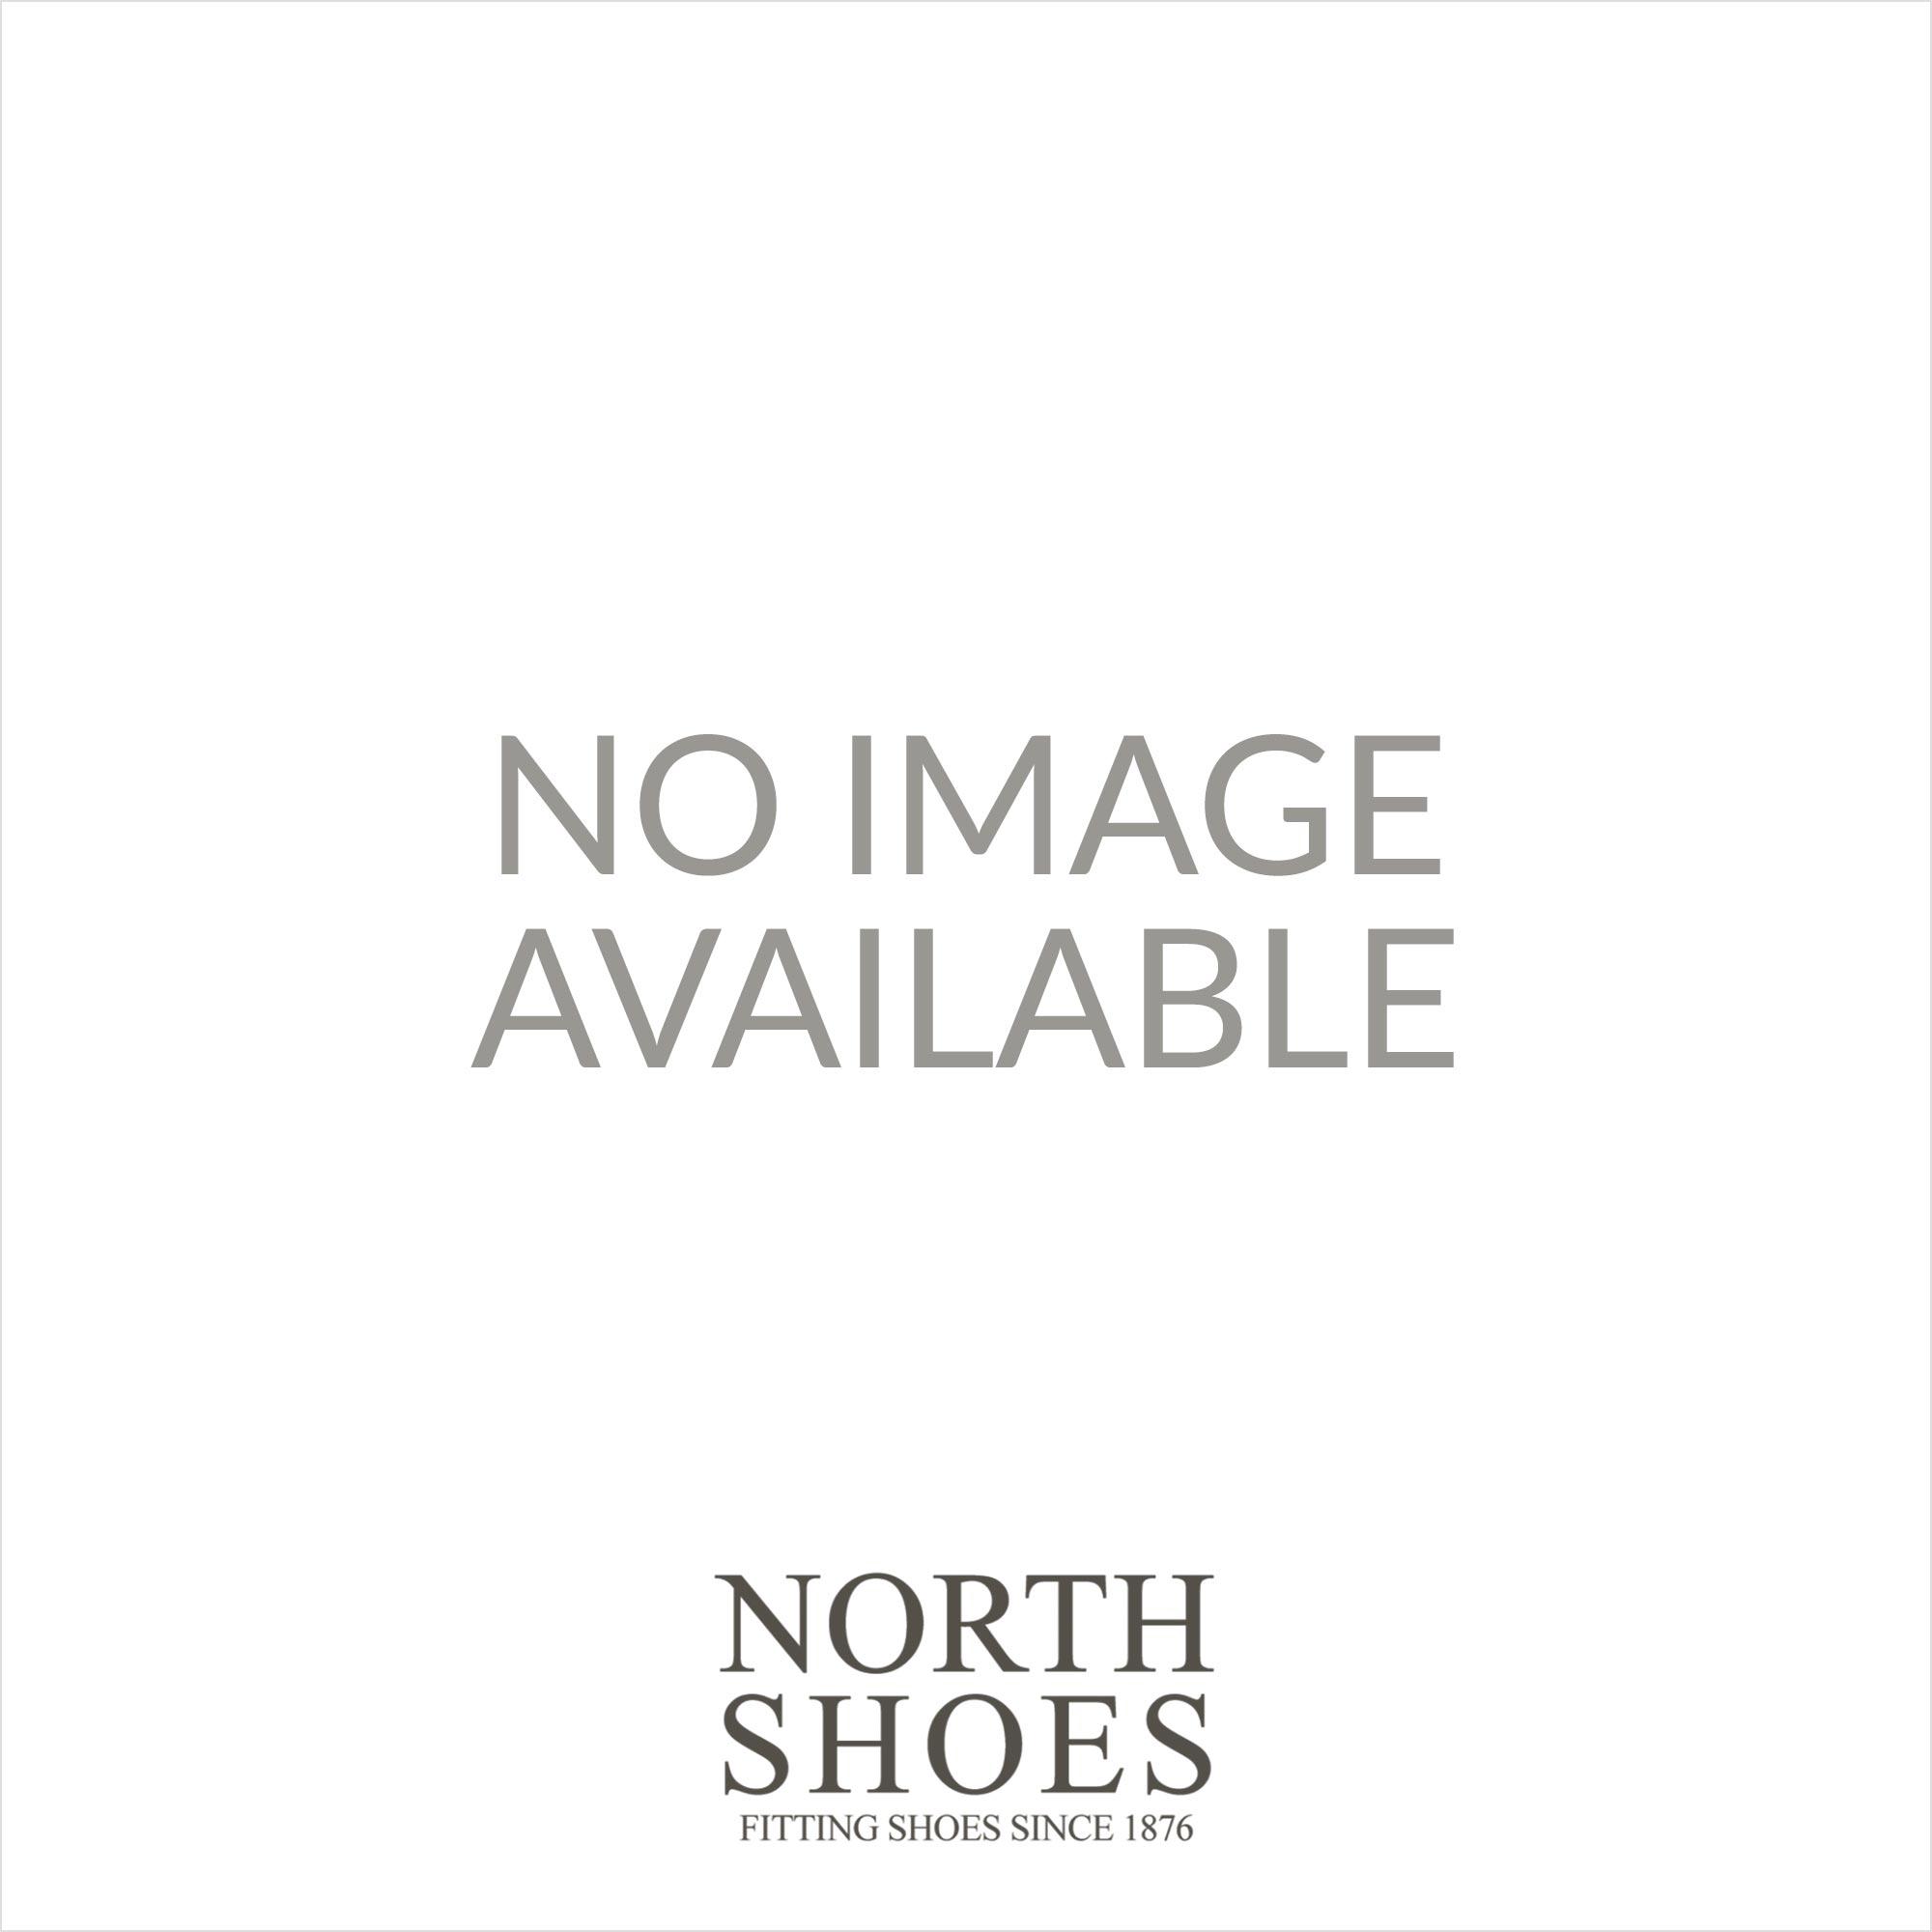 58d119cf67b Skechers Harsen Ortego 65620 Black Leather Mens Slip On Shoe - Skechers  from North Shoes UK